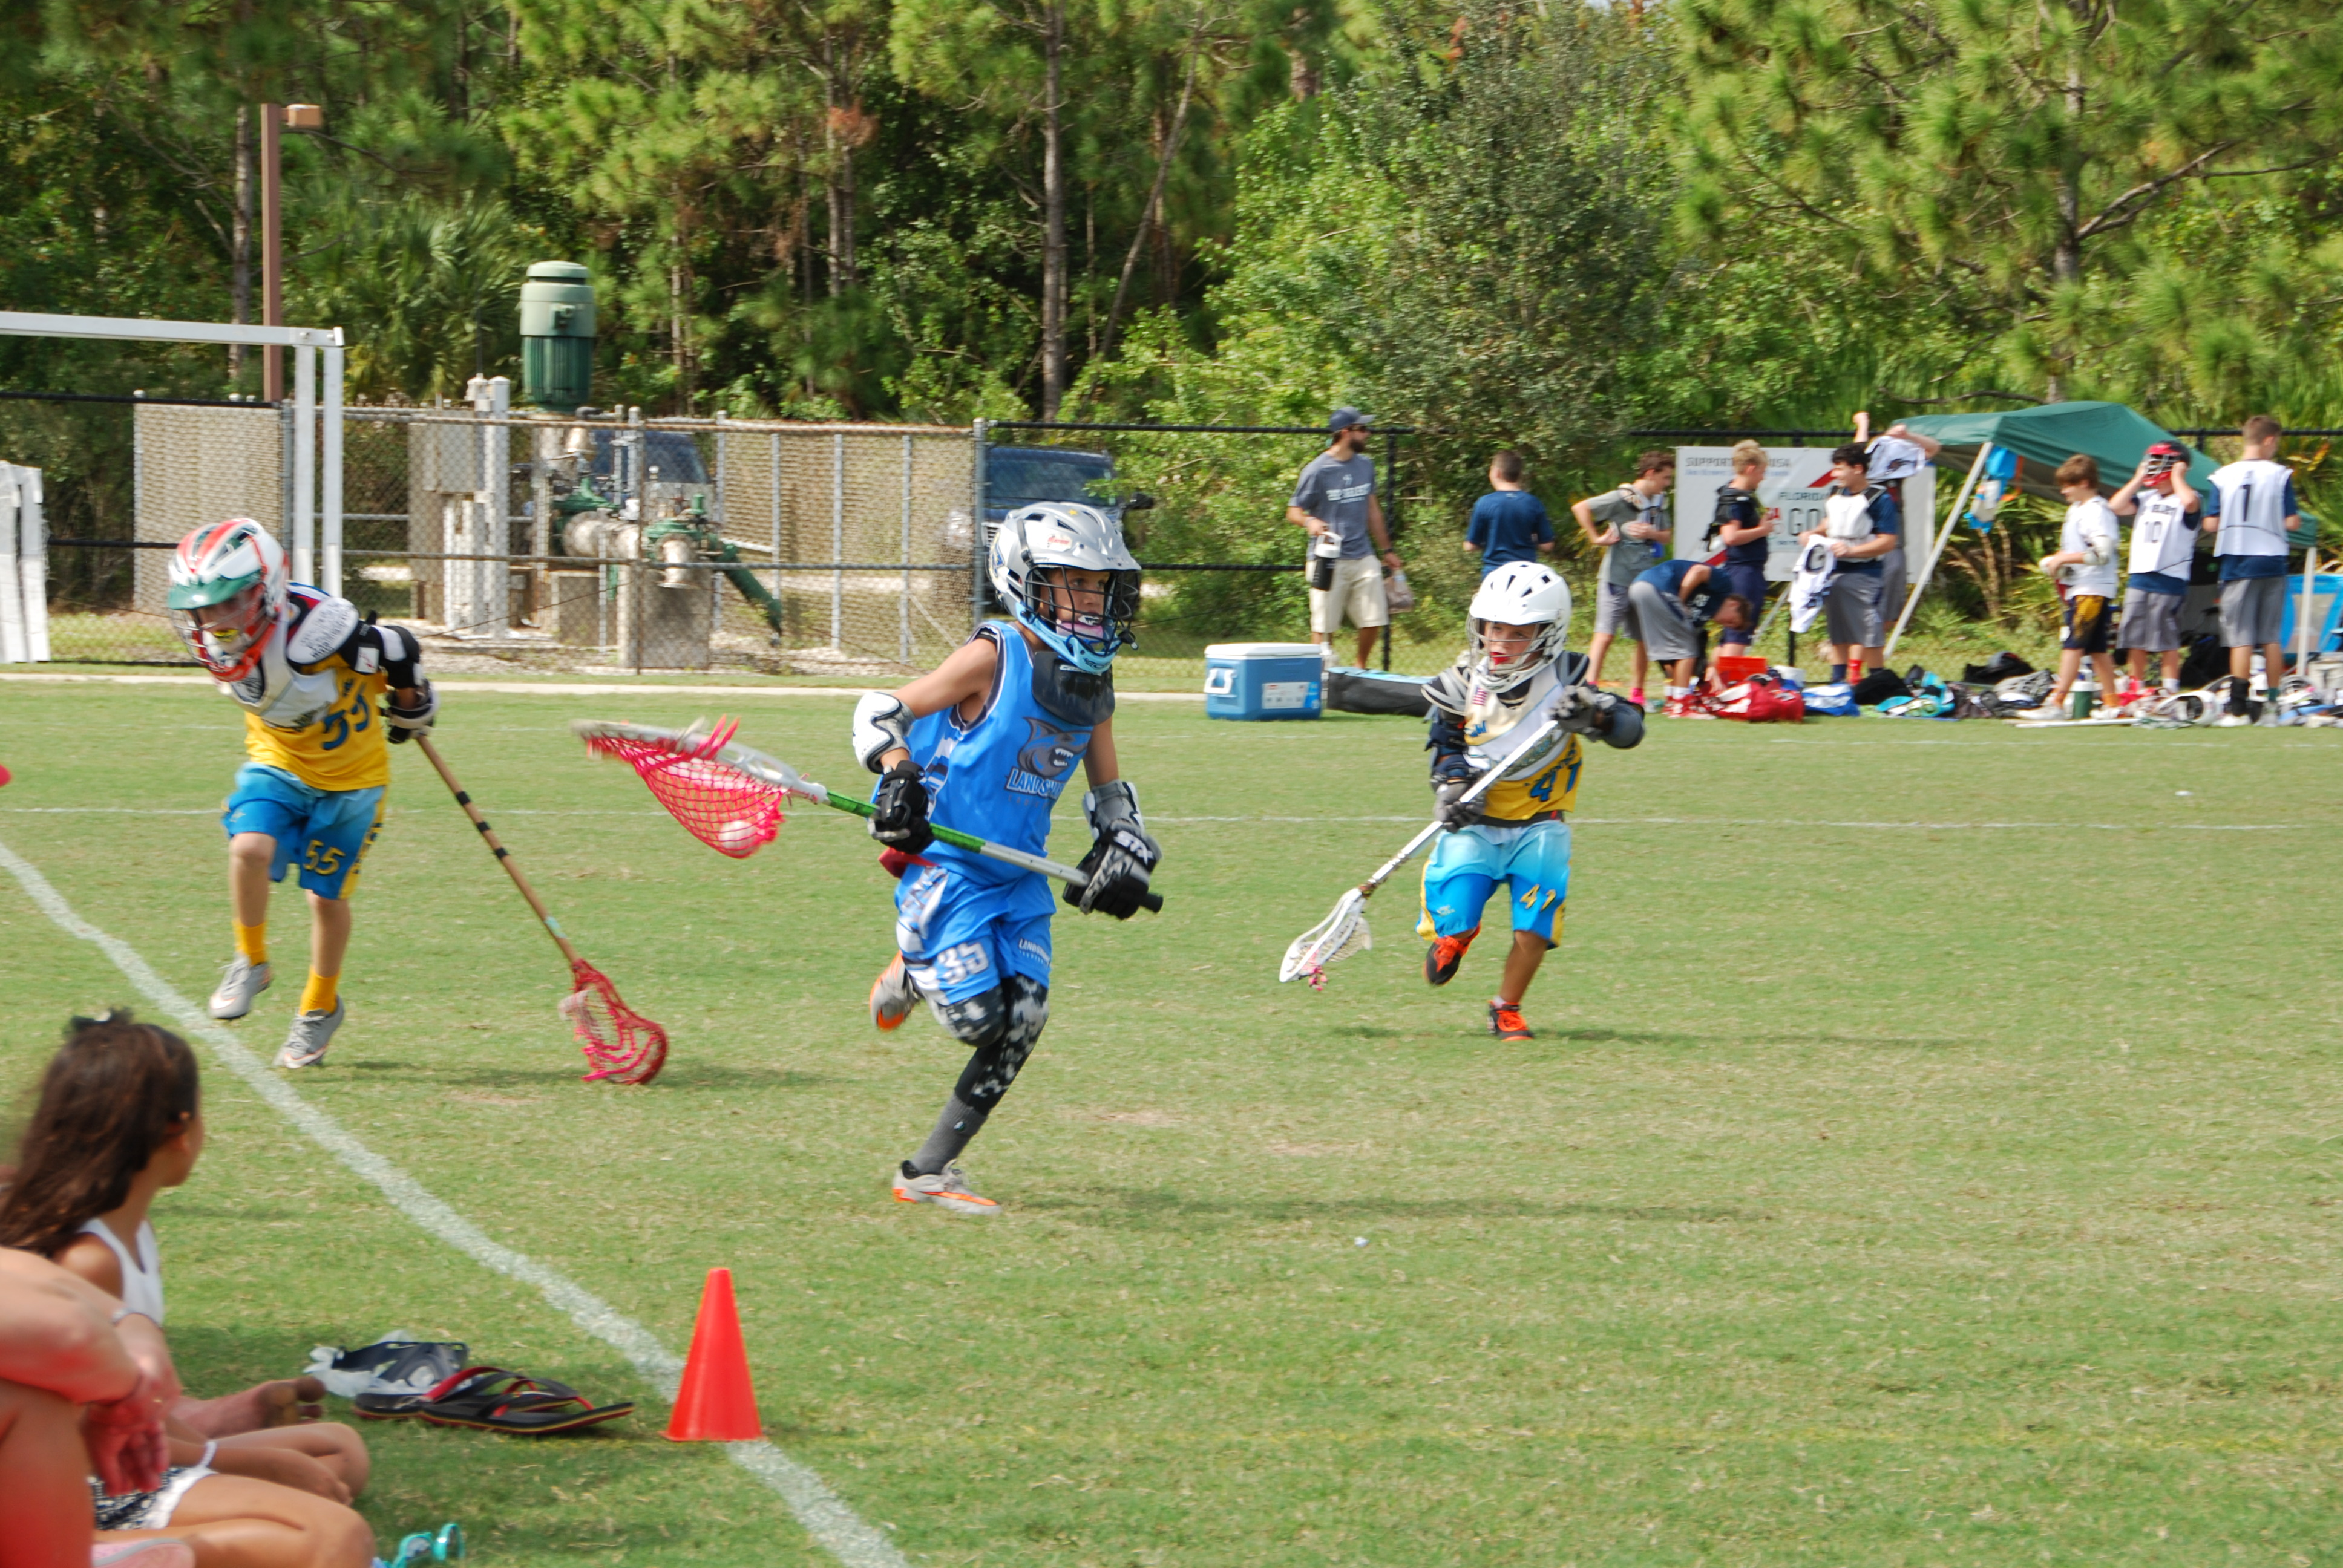 lauderdale-lacrosse-landsharks (20)